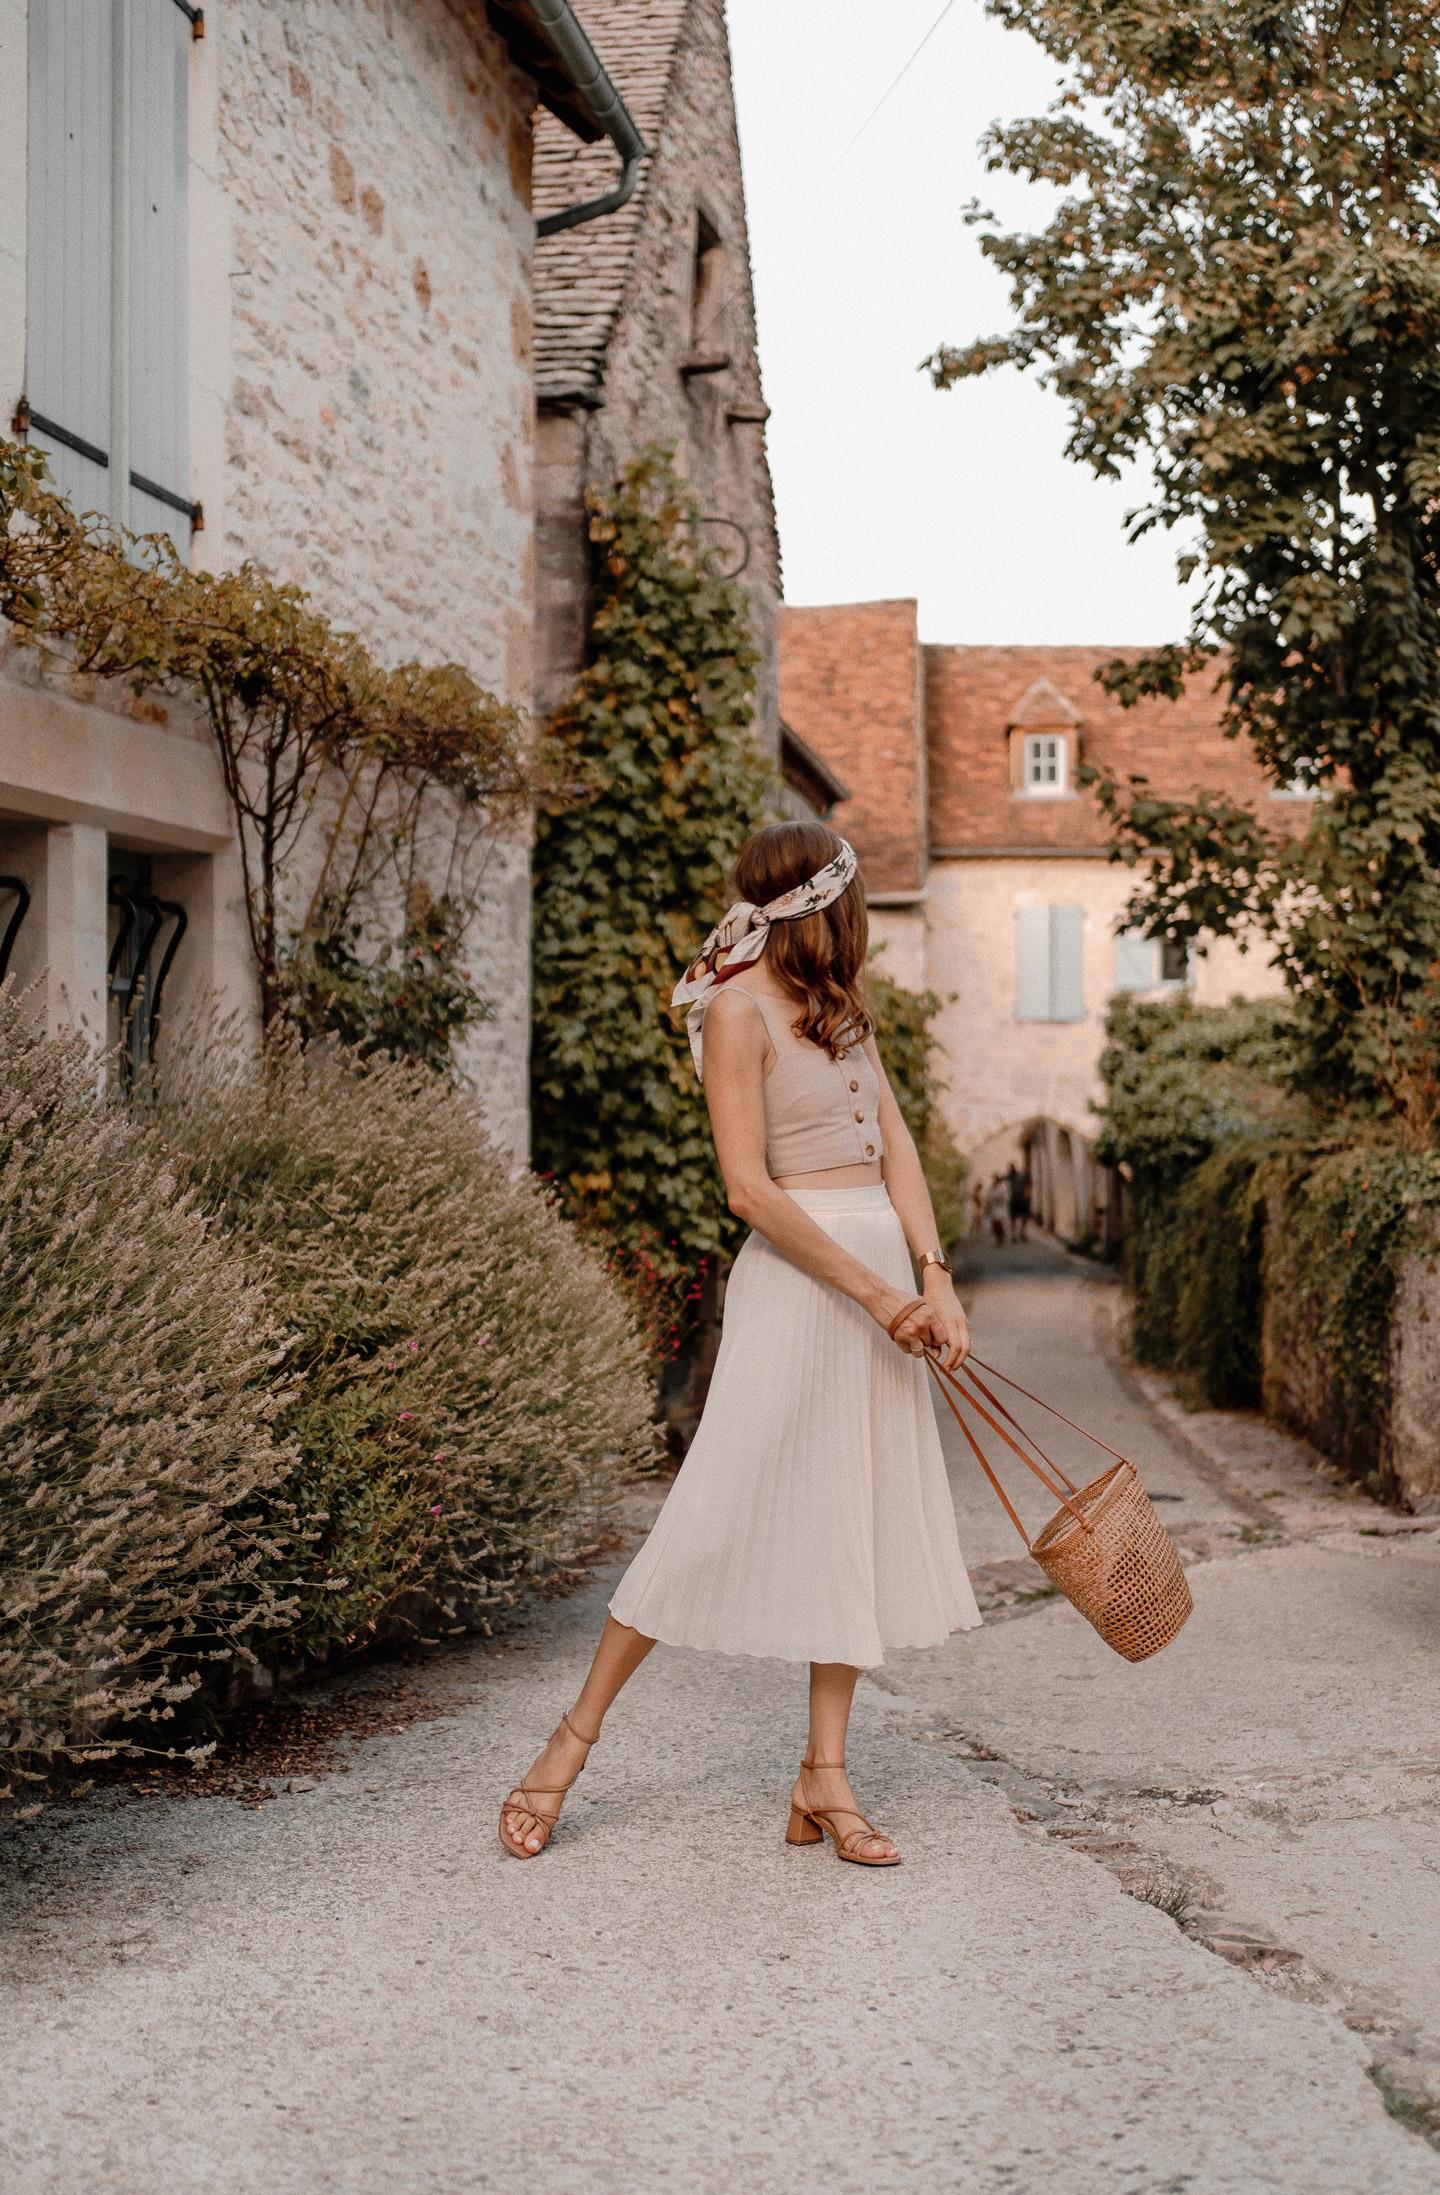 comment-porter-la-jupe-plissee3blog